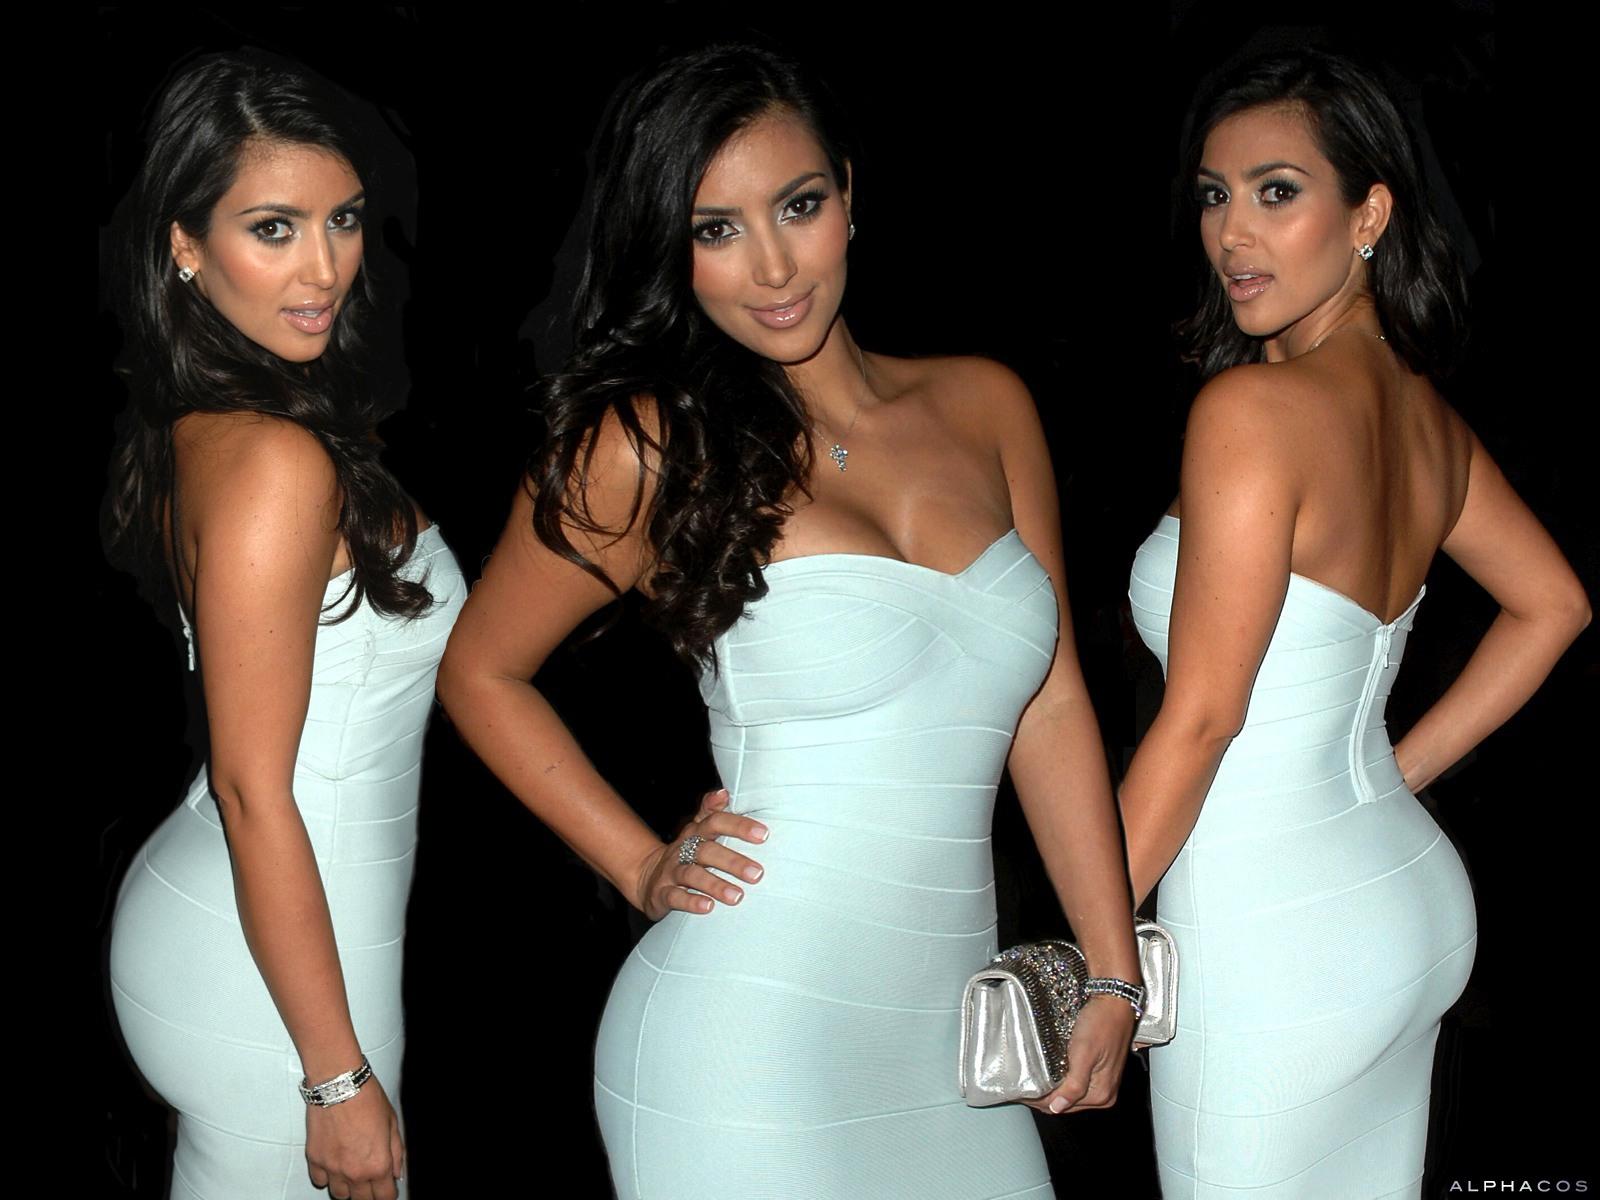 http://1.bp.blogspot.com/-4KIAz41QpYY/Tek22i50LzI/AAAAAAAABxY/OrguJlzU3YY/s1600/kim-kardashian-4.jpg